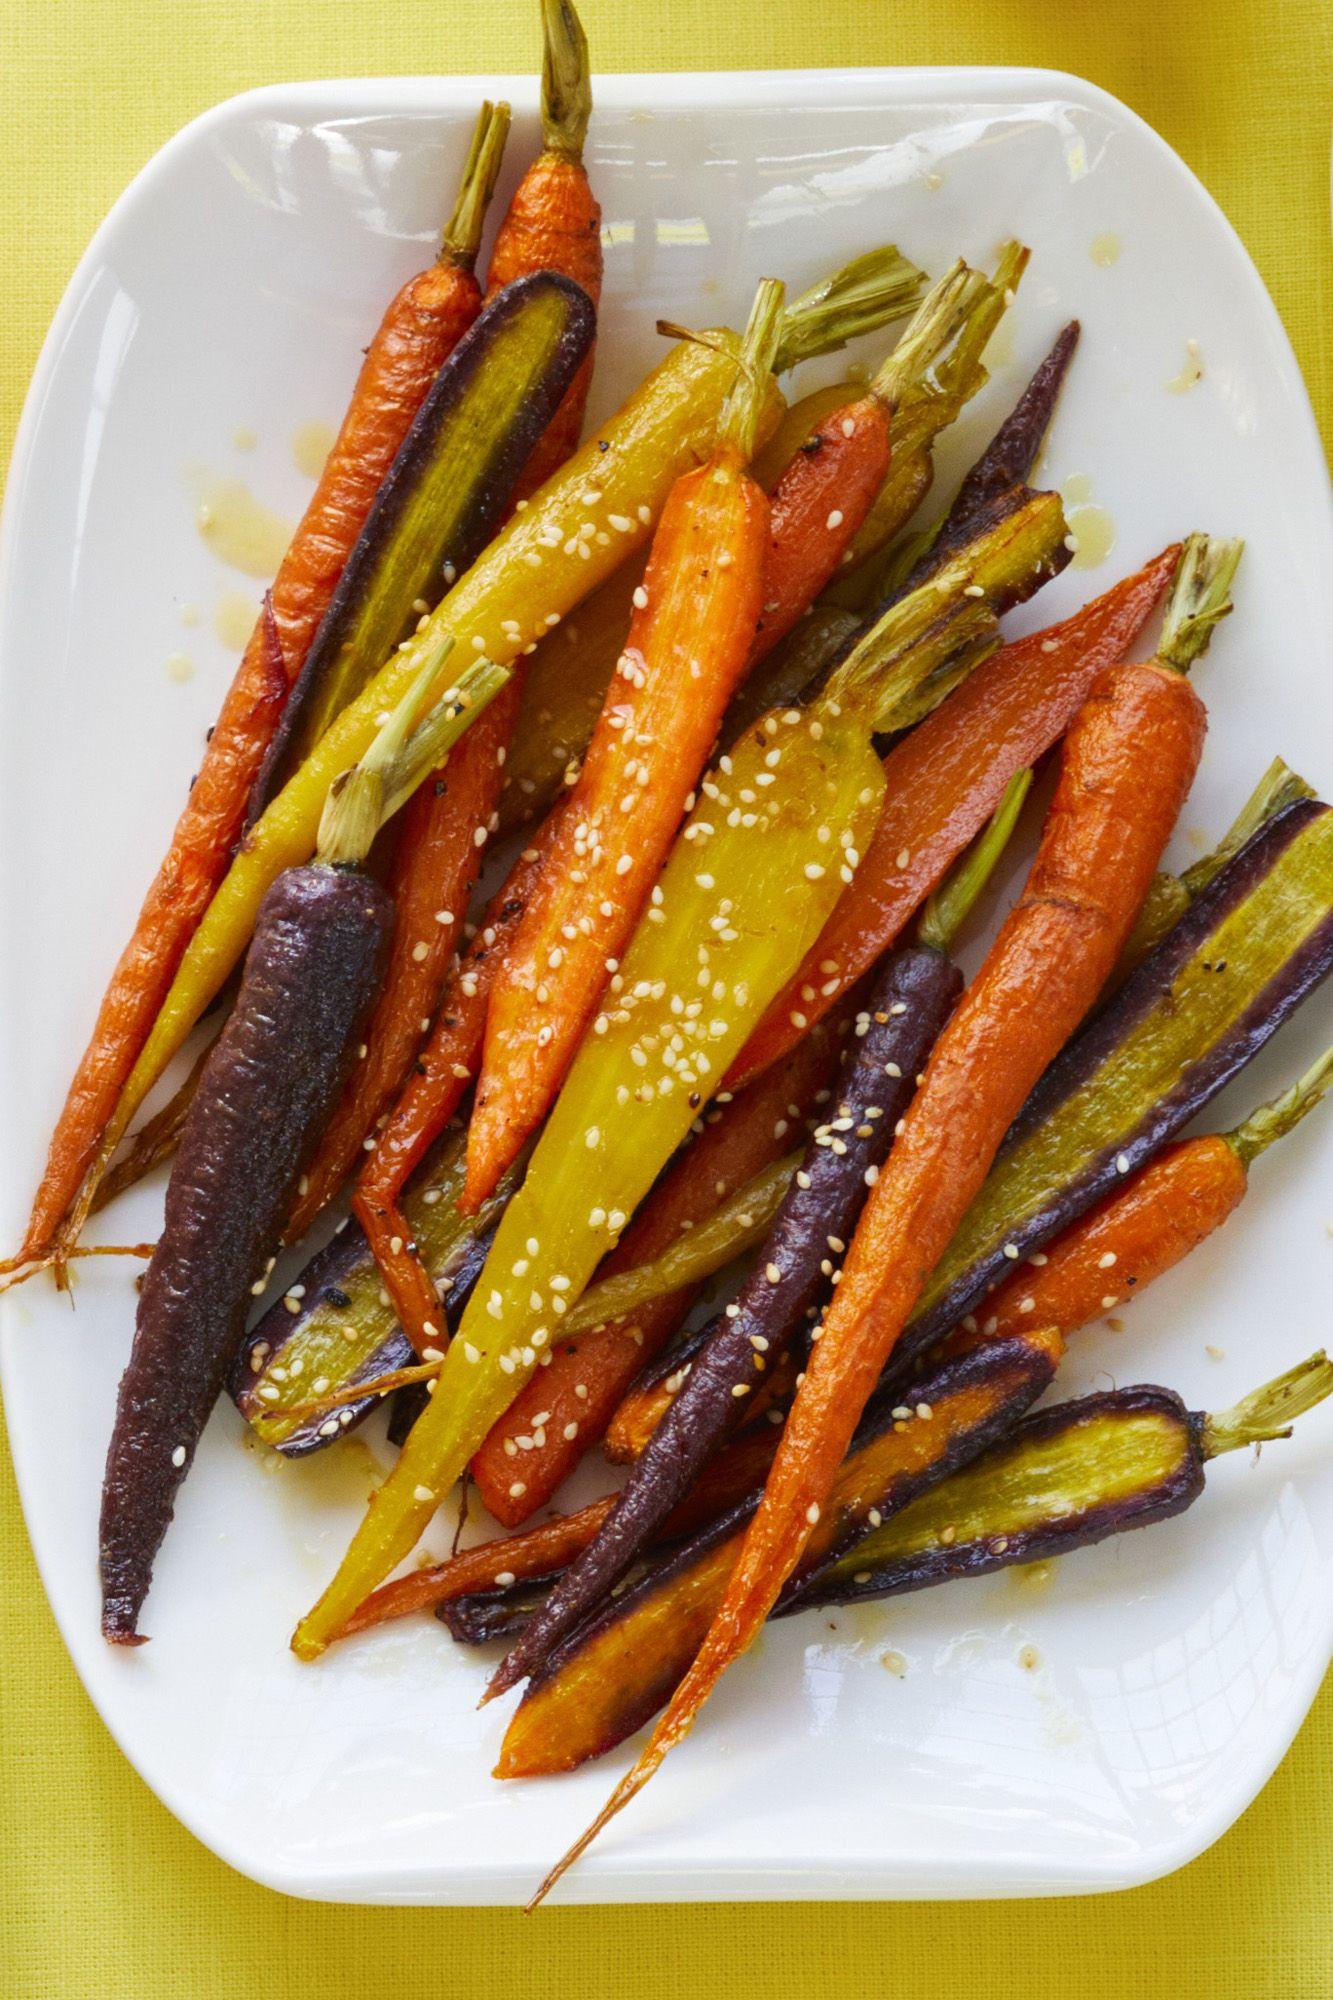 roasted carrots with citrus vinaigrette